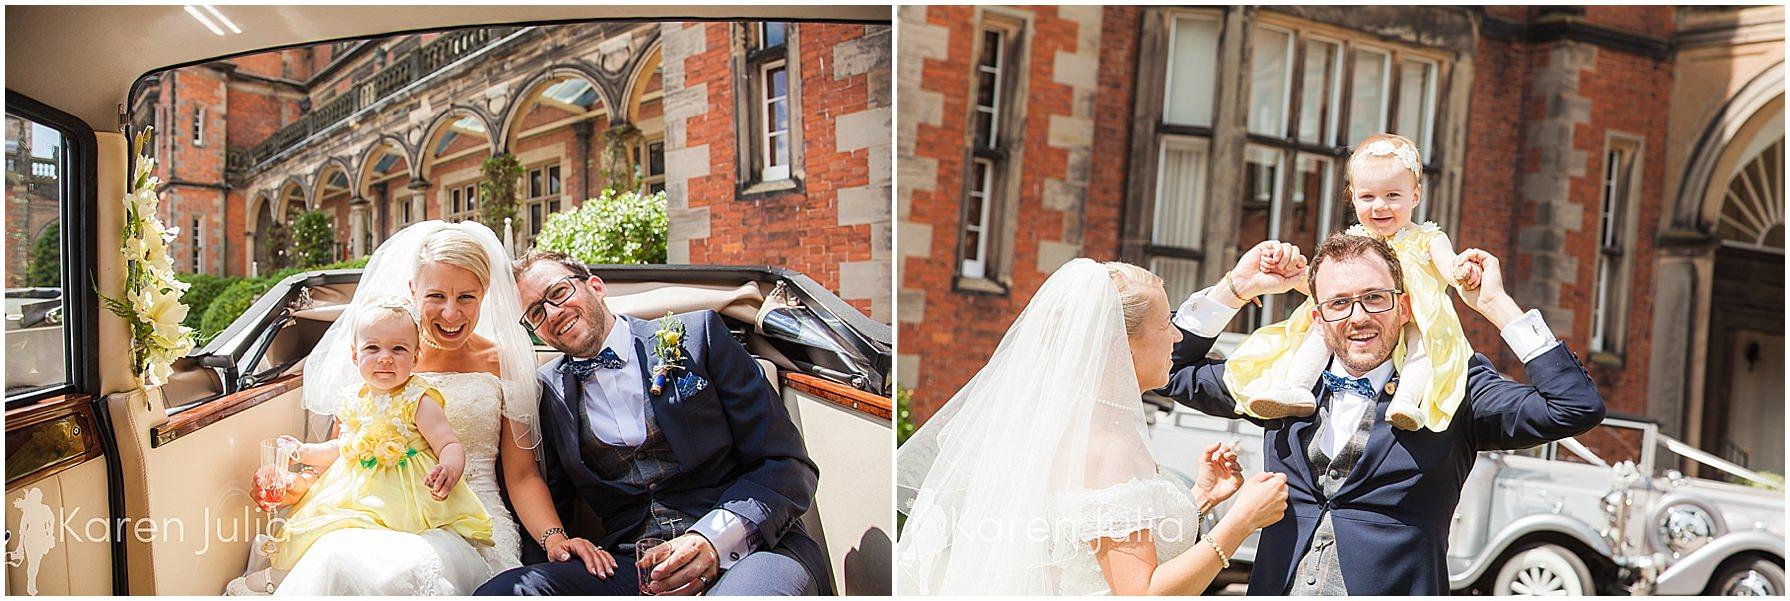 Capesthorne-Hall-Wedding-Photography-10